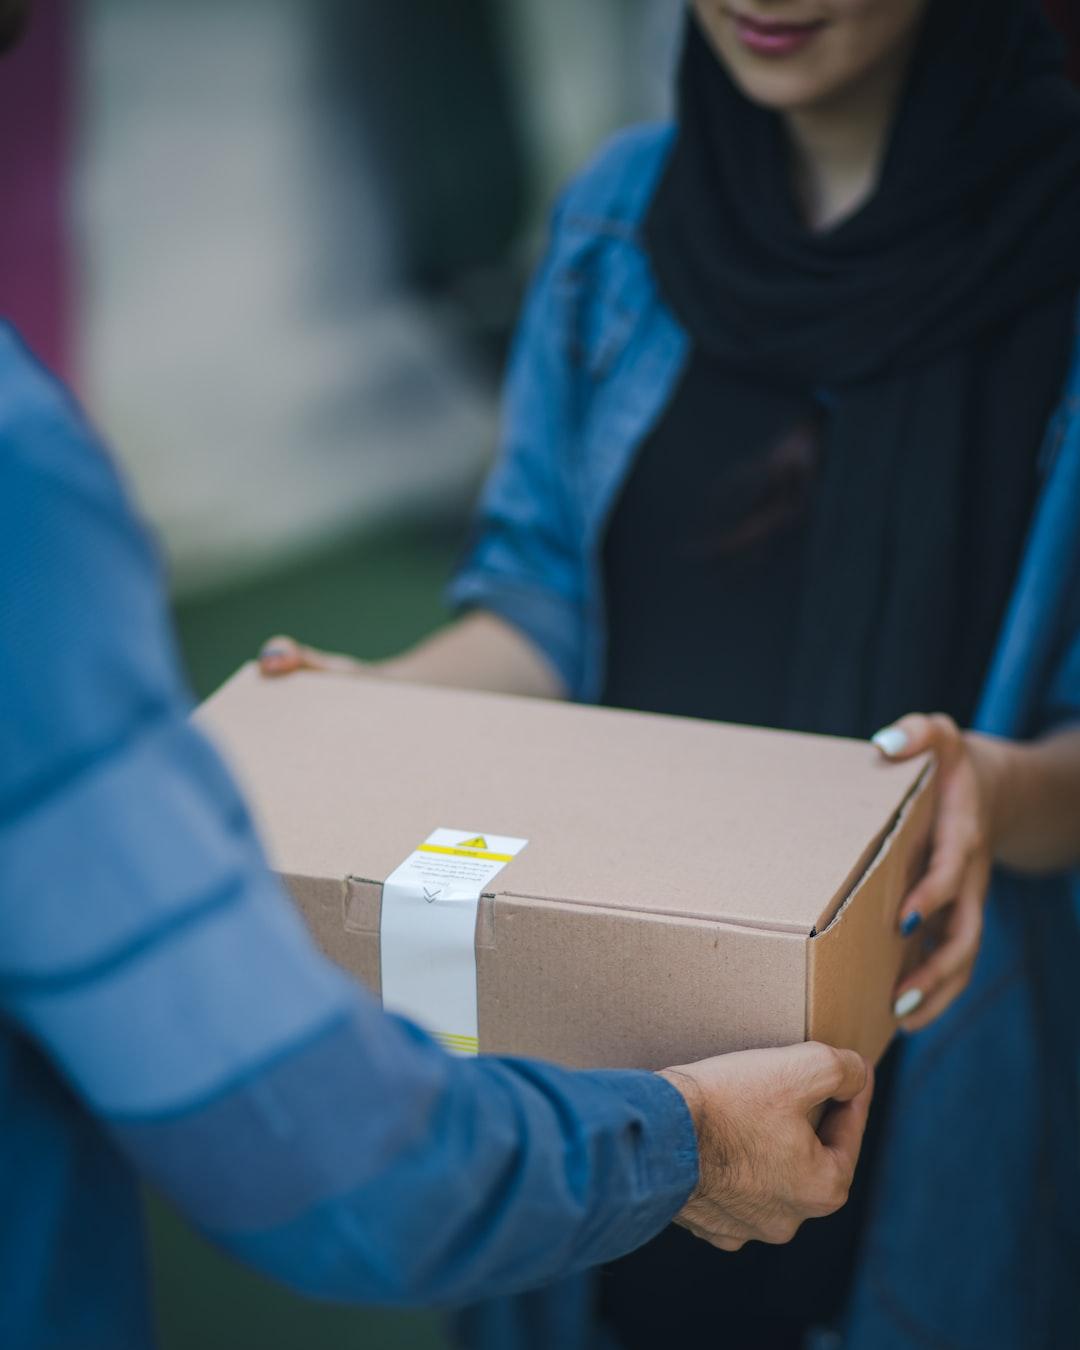 Box 1: پلمپ محرمانگی رز باکس - تجربه ای متفاوت و لذت بخش از خرید محصولات بهداشتی دوران قاعدگی  رز باکس چی هست؟ رزباکس یک روش جدید خرید محصولات بهداشتی است. ما تلاش کرده ایم محصولی بسازیم که تجربهی خریدهای دورهای و بهداشتی را بهبود دهیم. این محصول علاوه بر شامل بودن محصولات دوران قاعدگی، چیزهای دیگری دارد که باعث راحتی بیشتر در دوران پریود میشود.